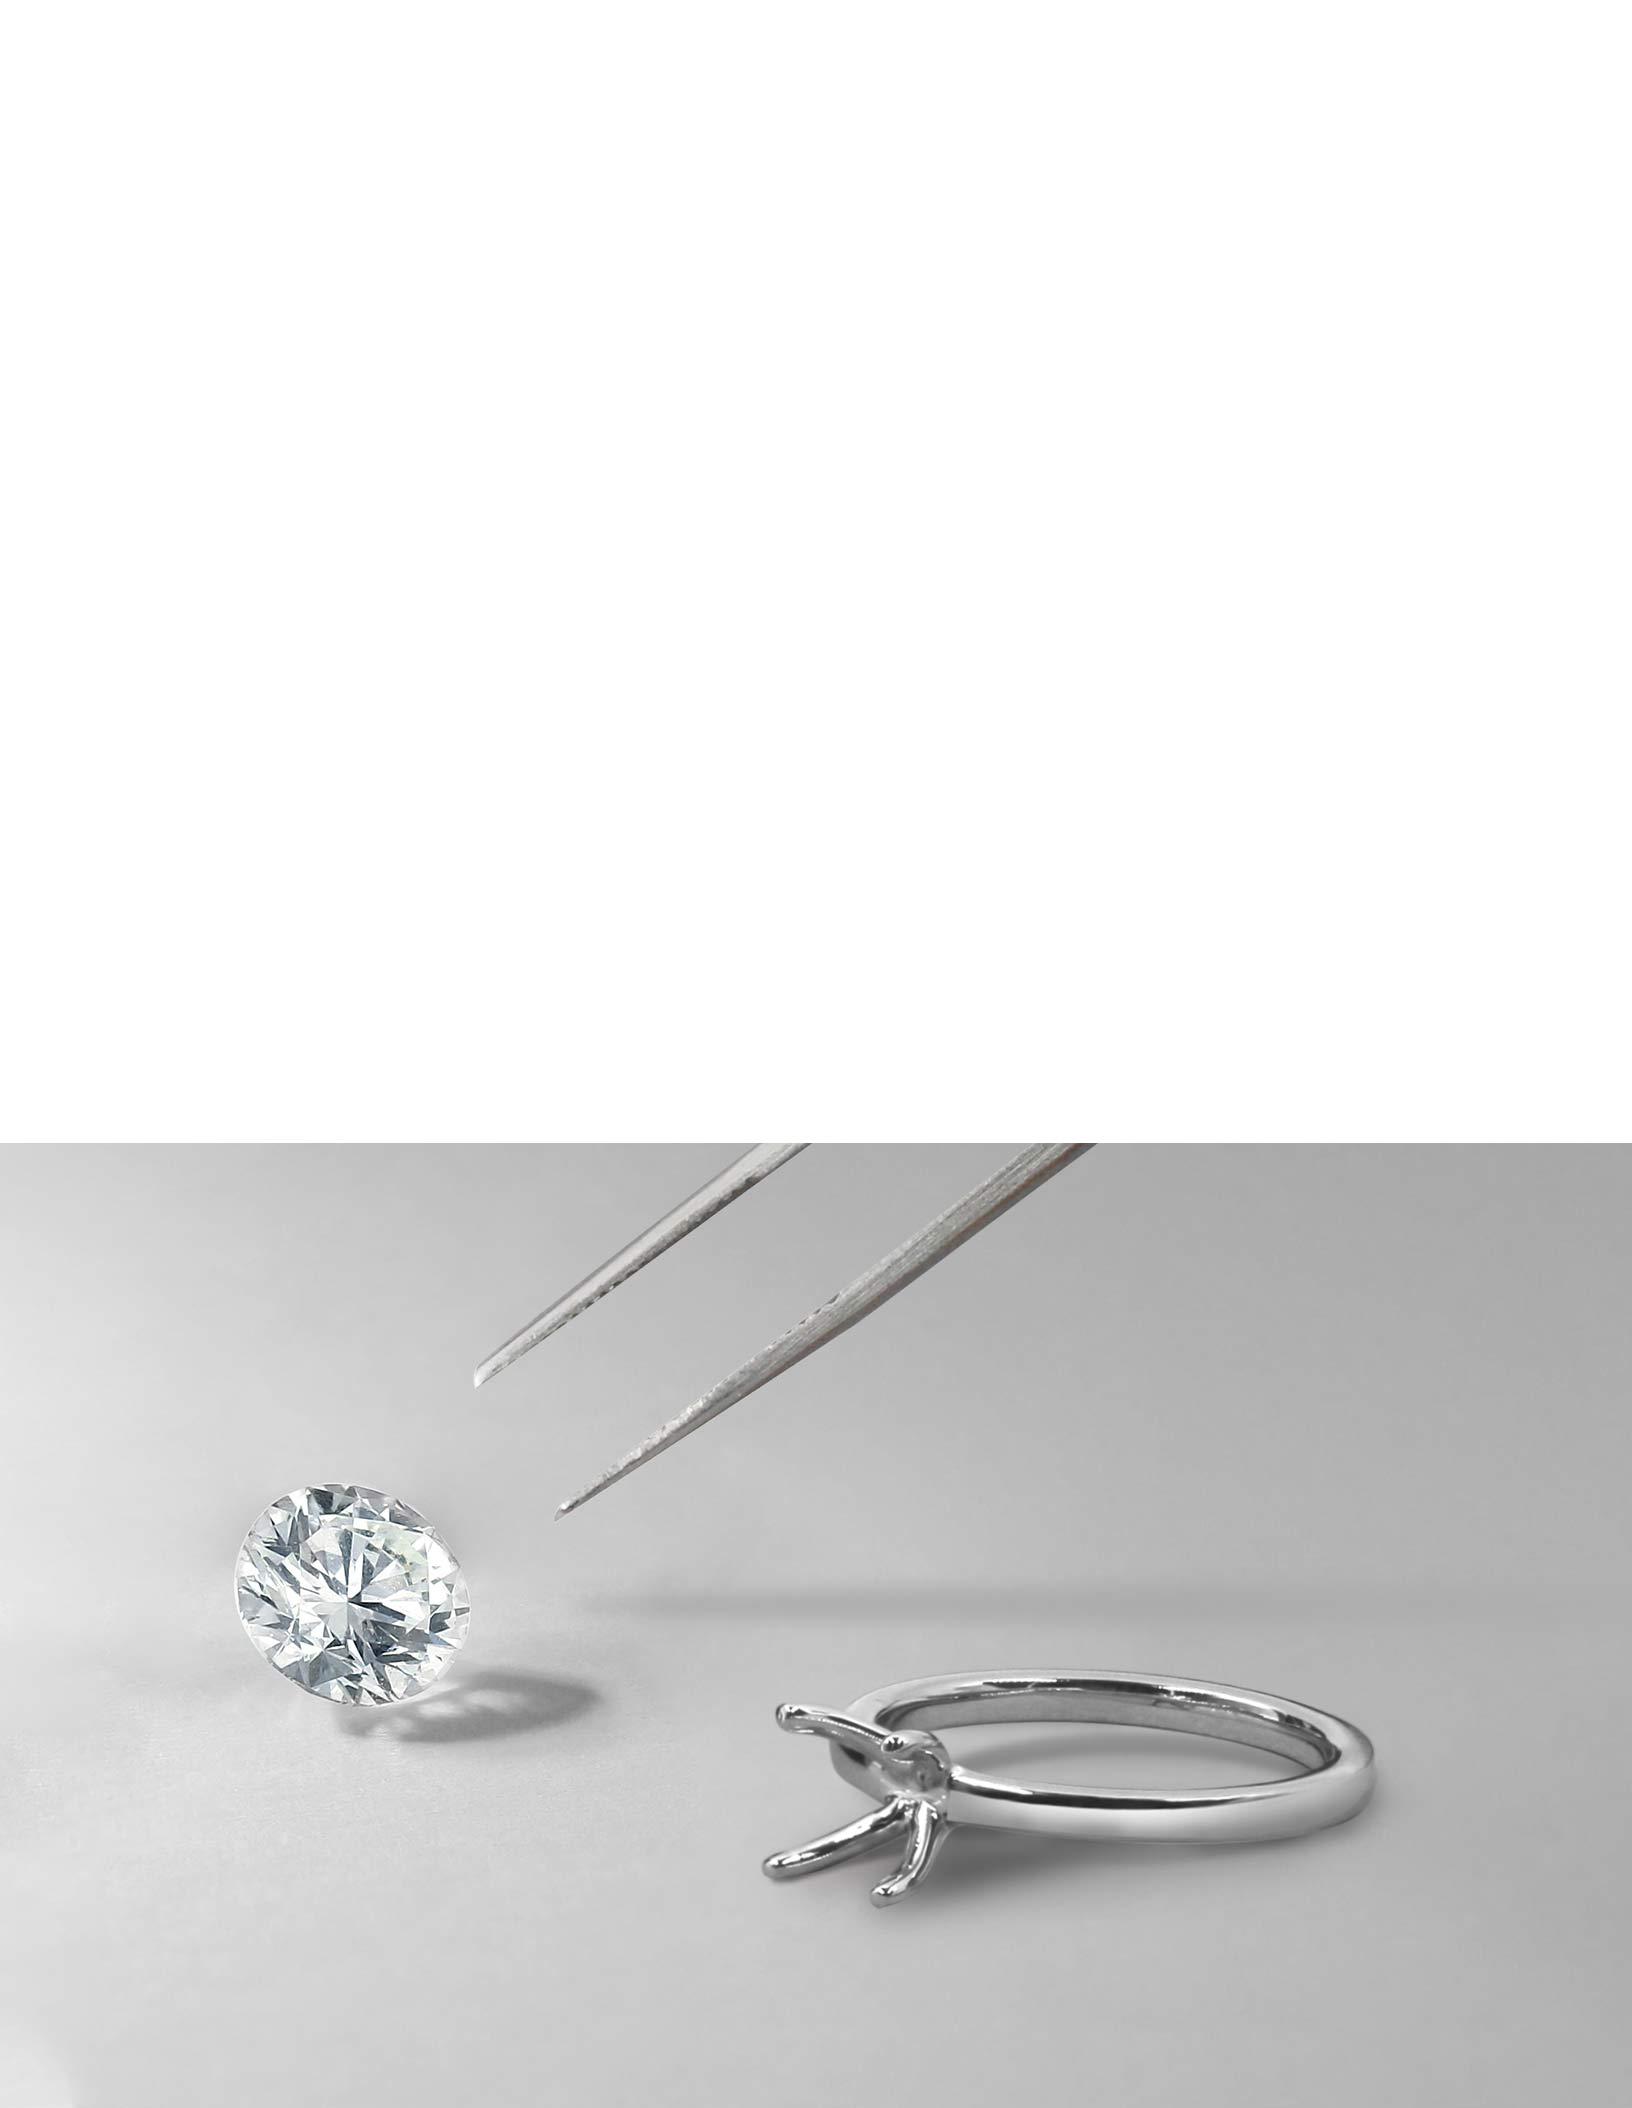 Platinum Cushion Cut Engagement Rings - Steven Stone